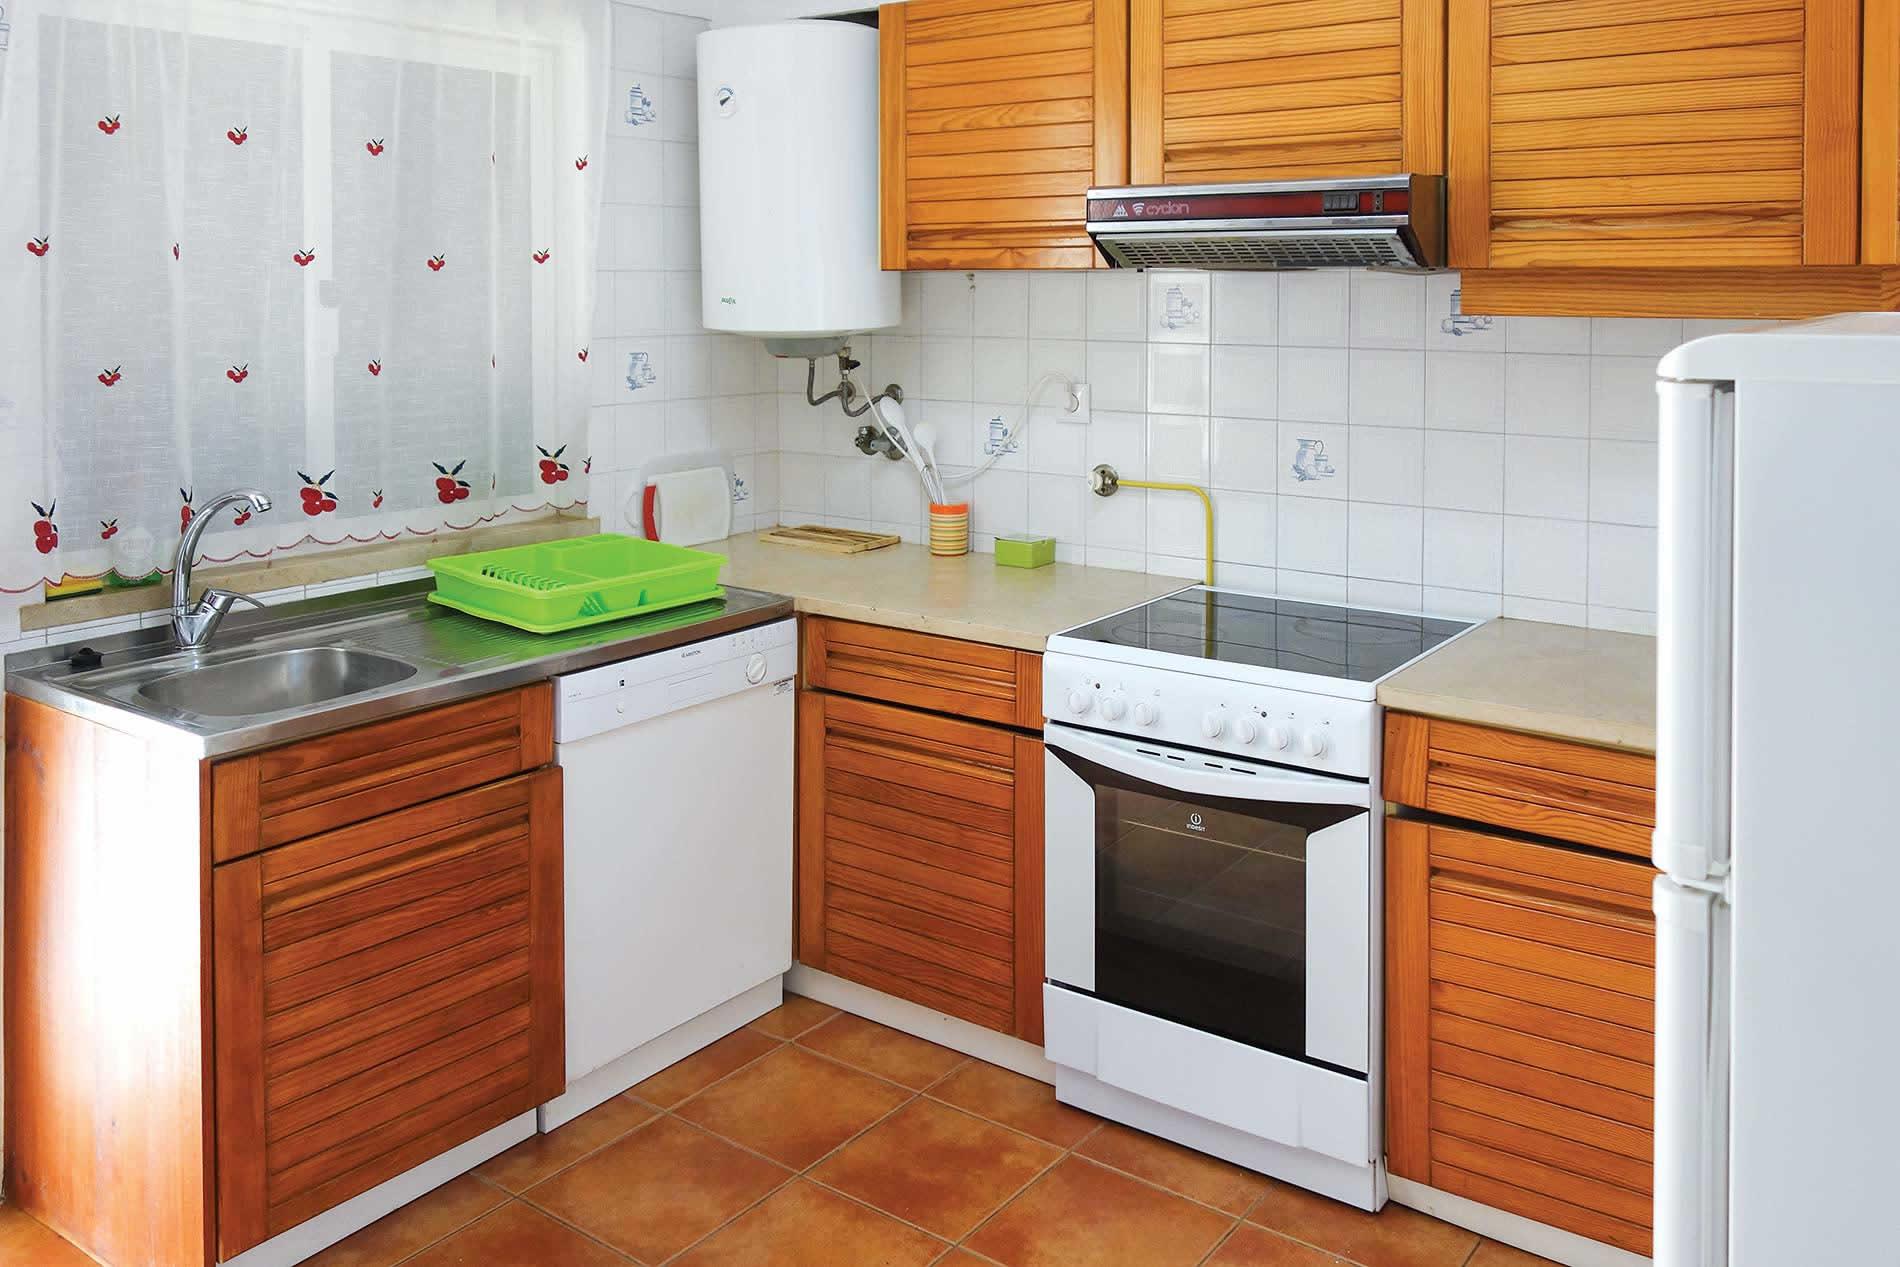 Casa Suzy in Vilamoura, Algarve - sleeps 6 people